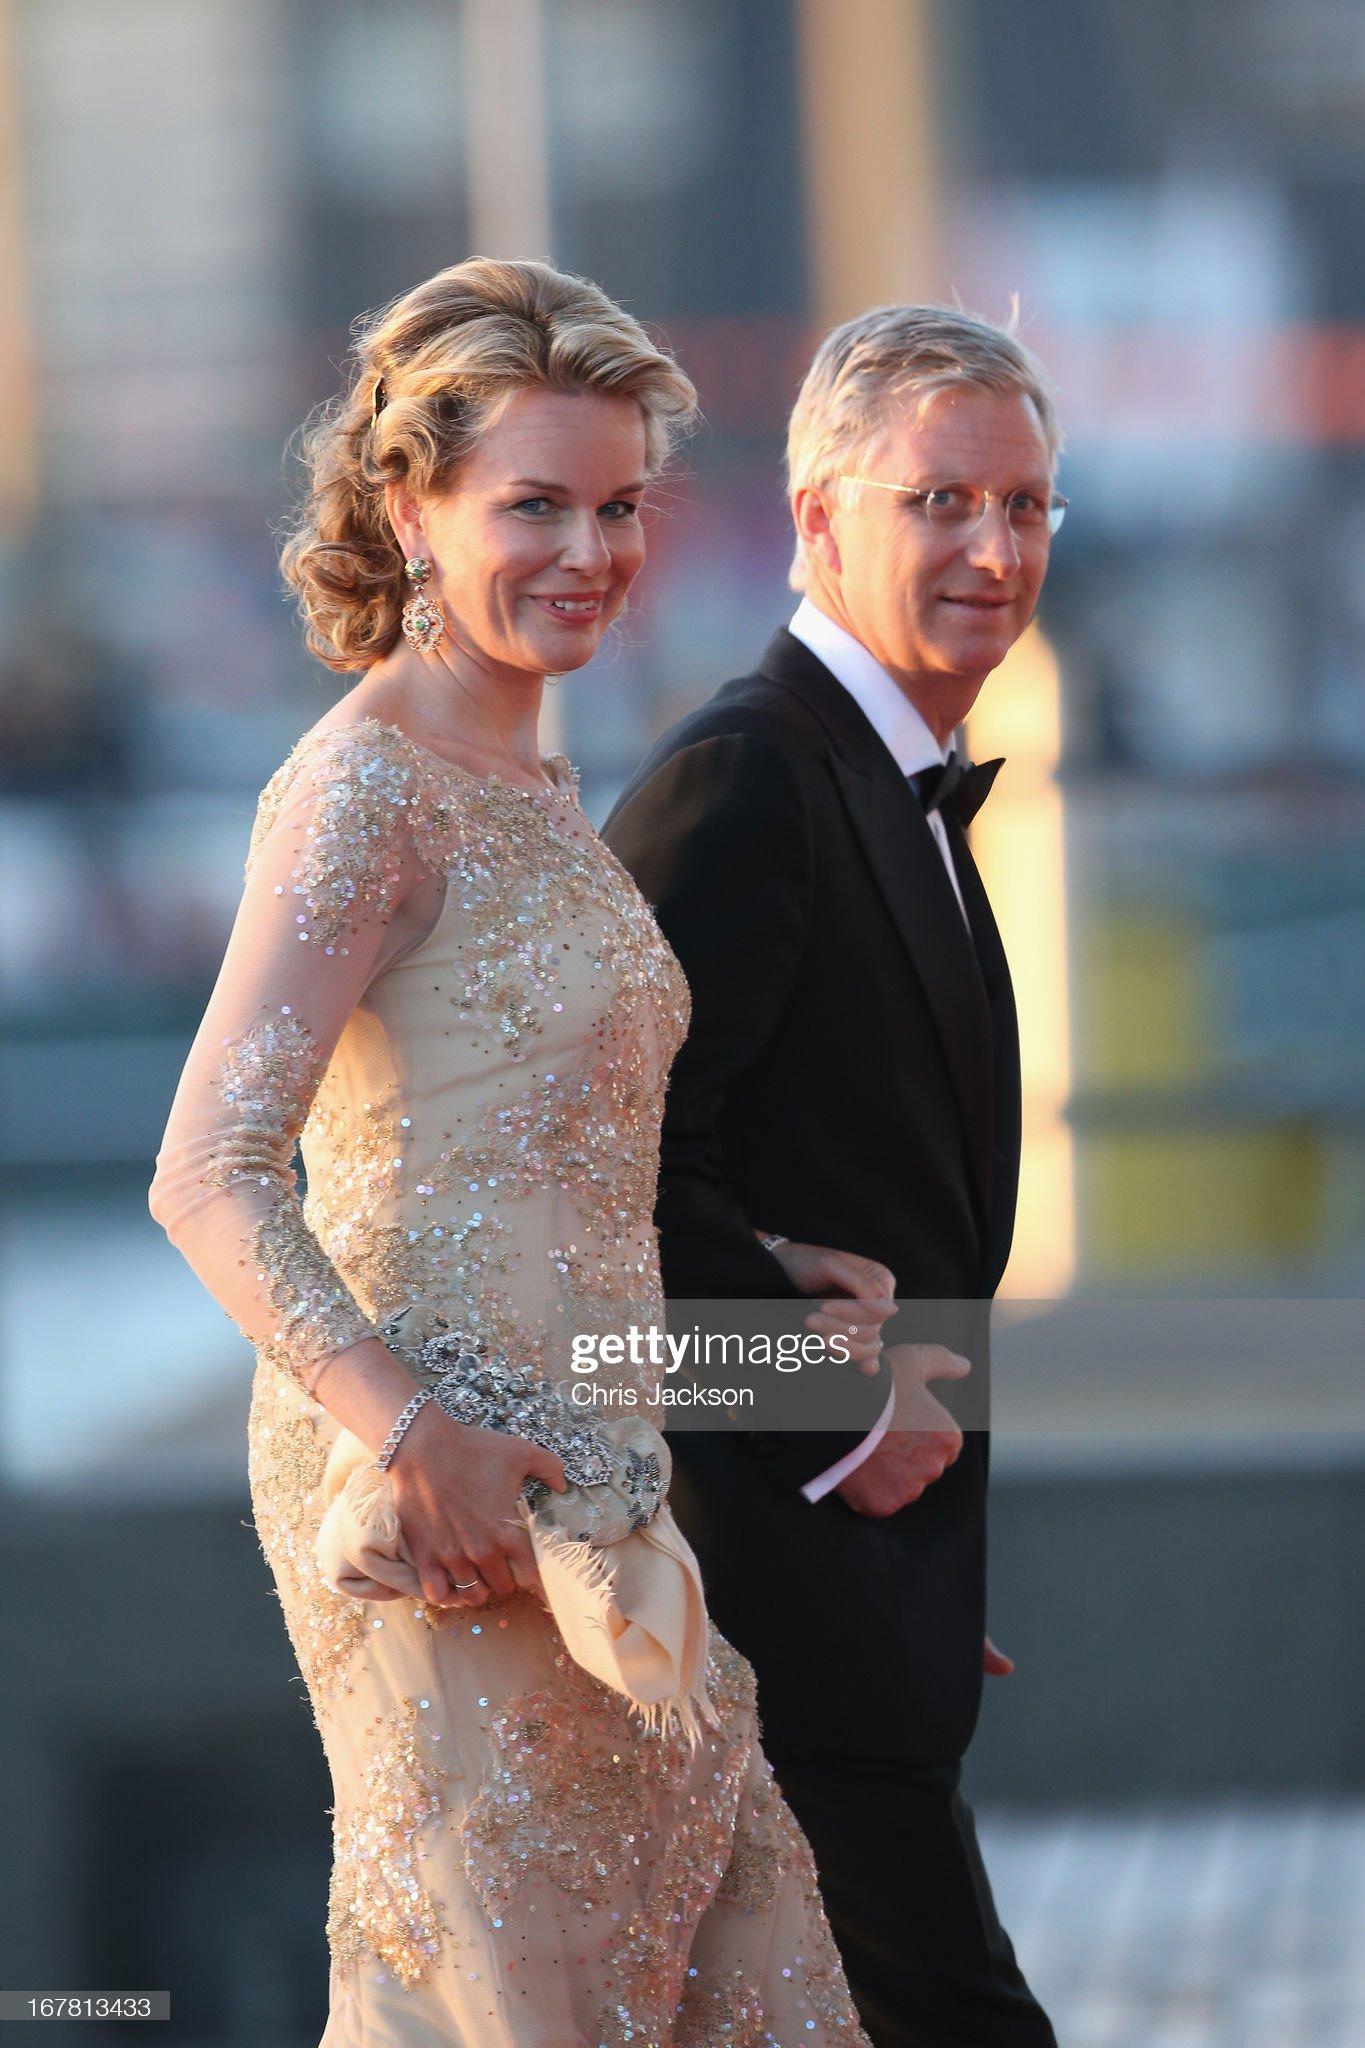 Вечерние наряды Королевы Матильды Inauguration Of King Willem Alexander As Queen Beatrix Of The Netherlands Abdicates : News Photo